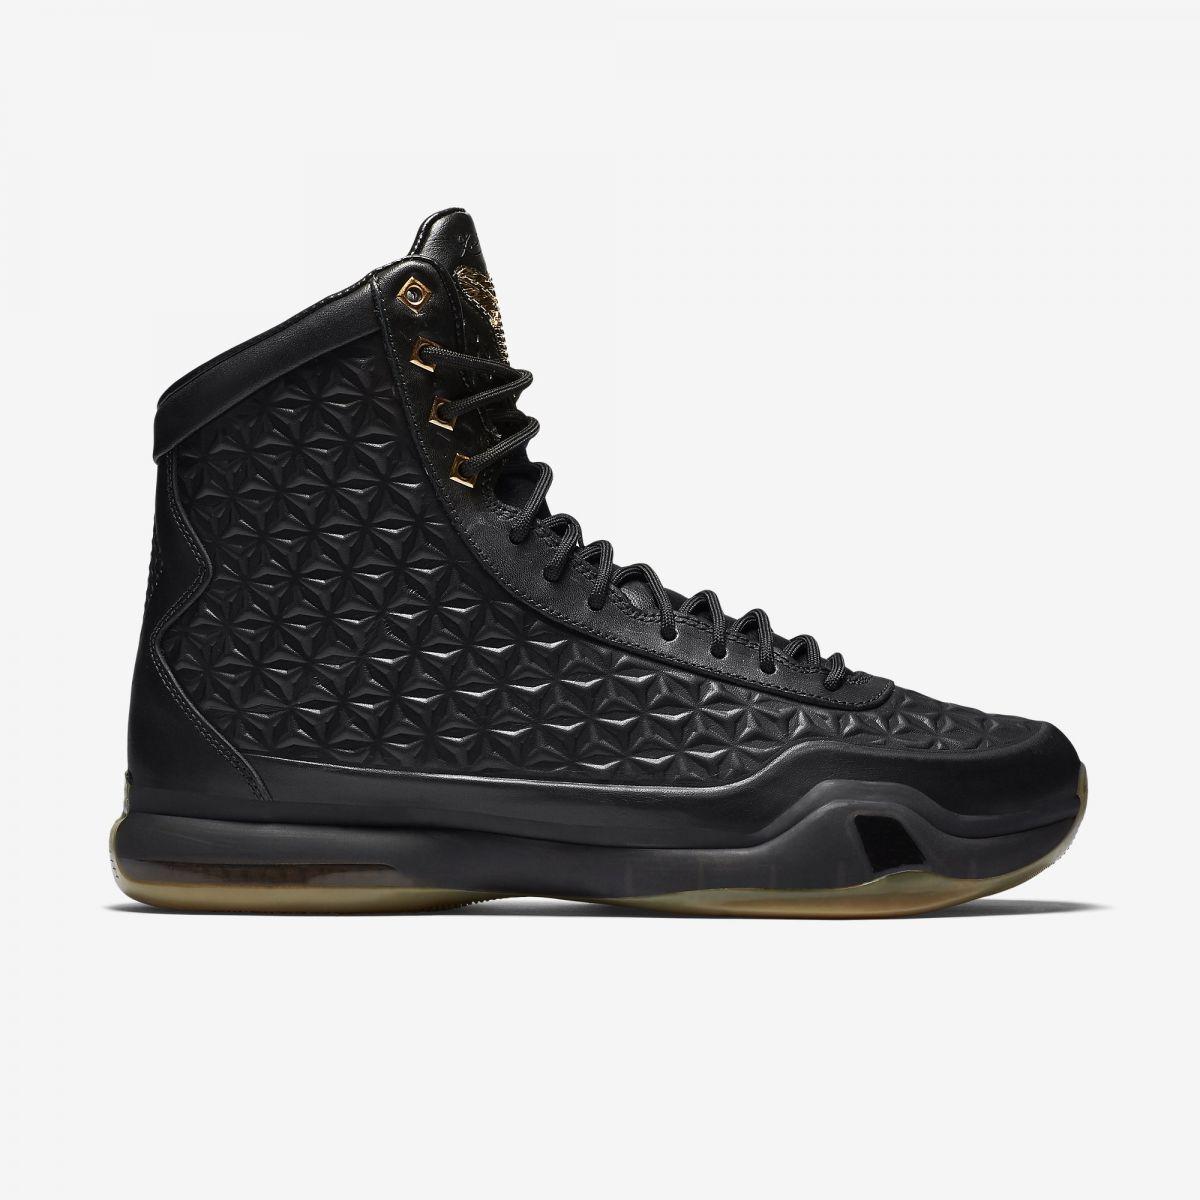 quality design cc9ba 47568 Nike Kobe X EXT High  Black Gold